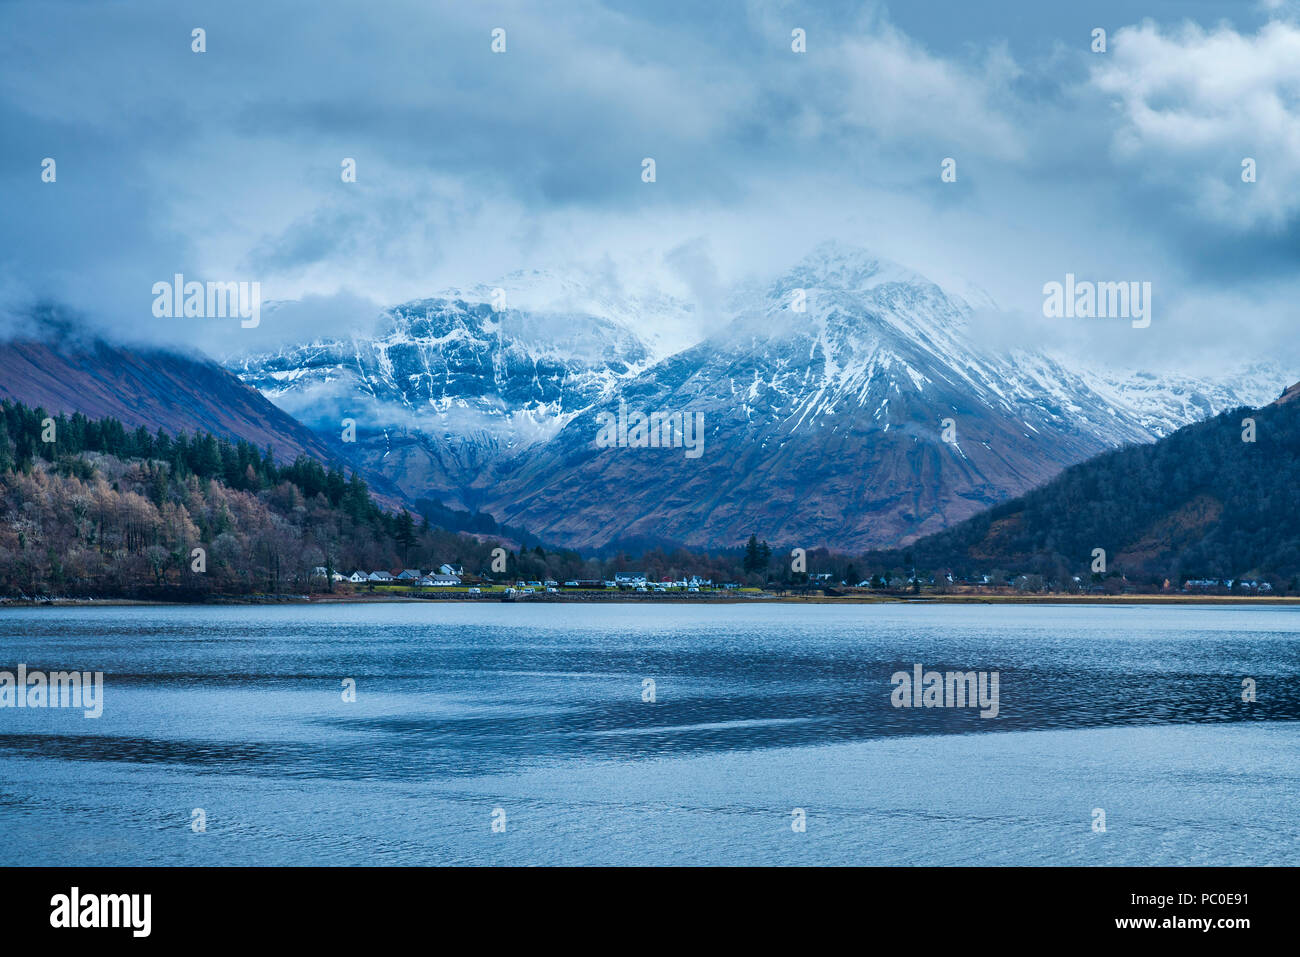 Loch Leven, North Ballachulish, Lochaber, Highland, Scotland, United Kingdom, Europe - Stock Image